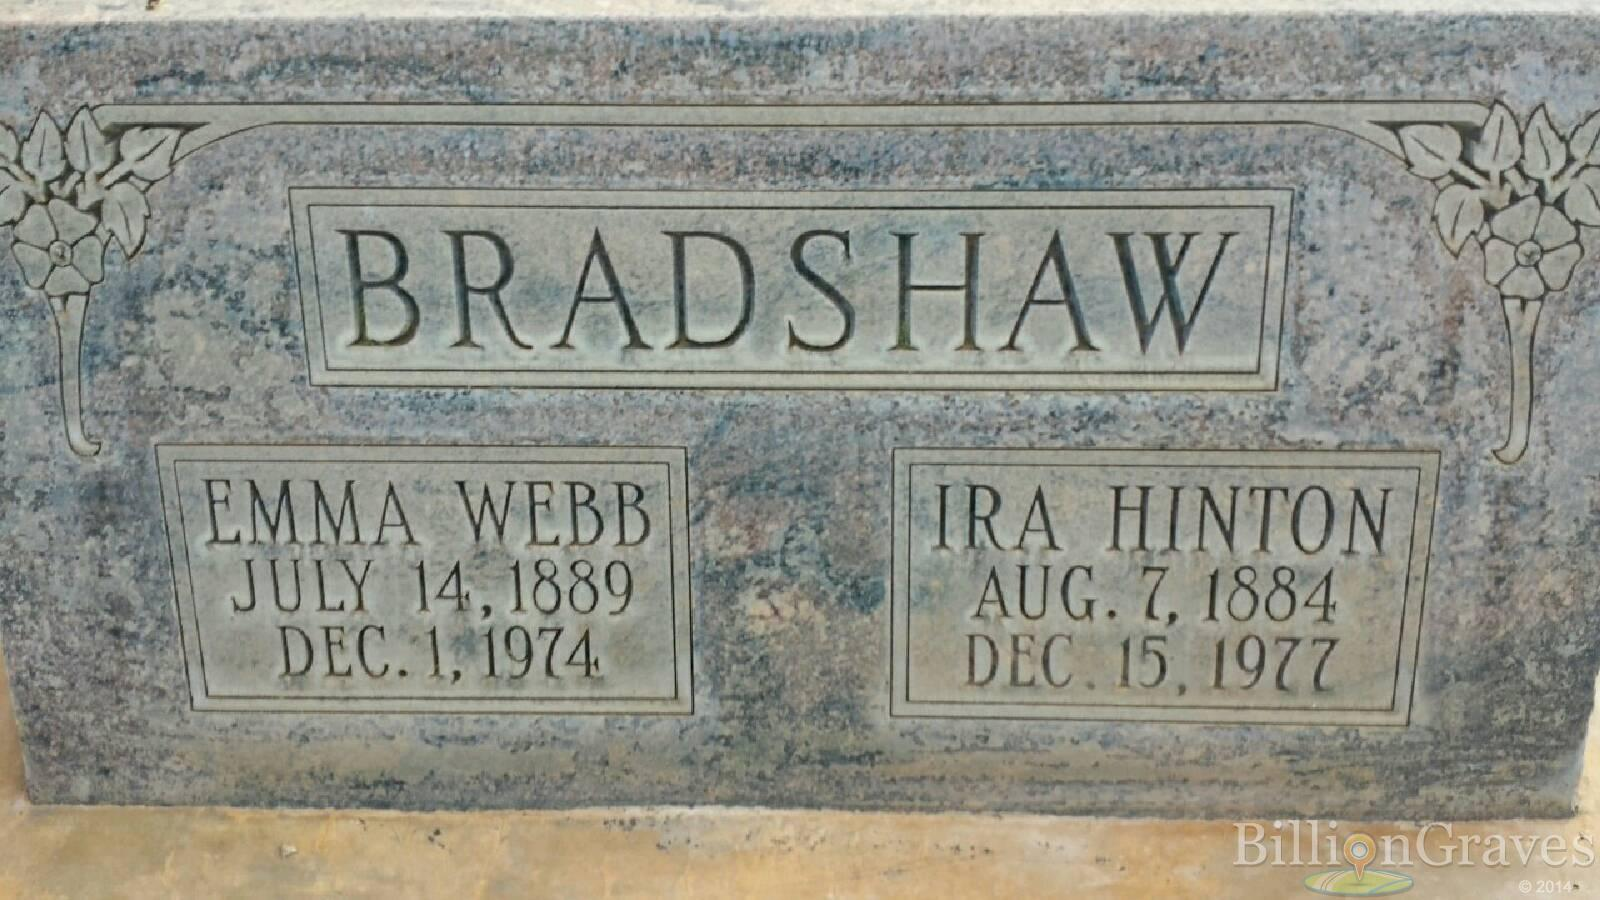 grave site of emma bradshaw webb billiongraves headstone image of emma bradshaw webb